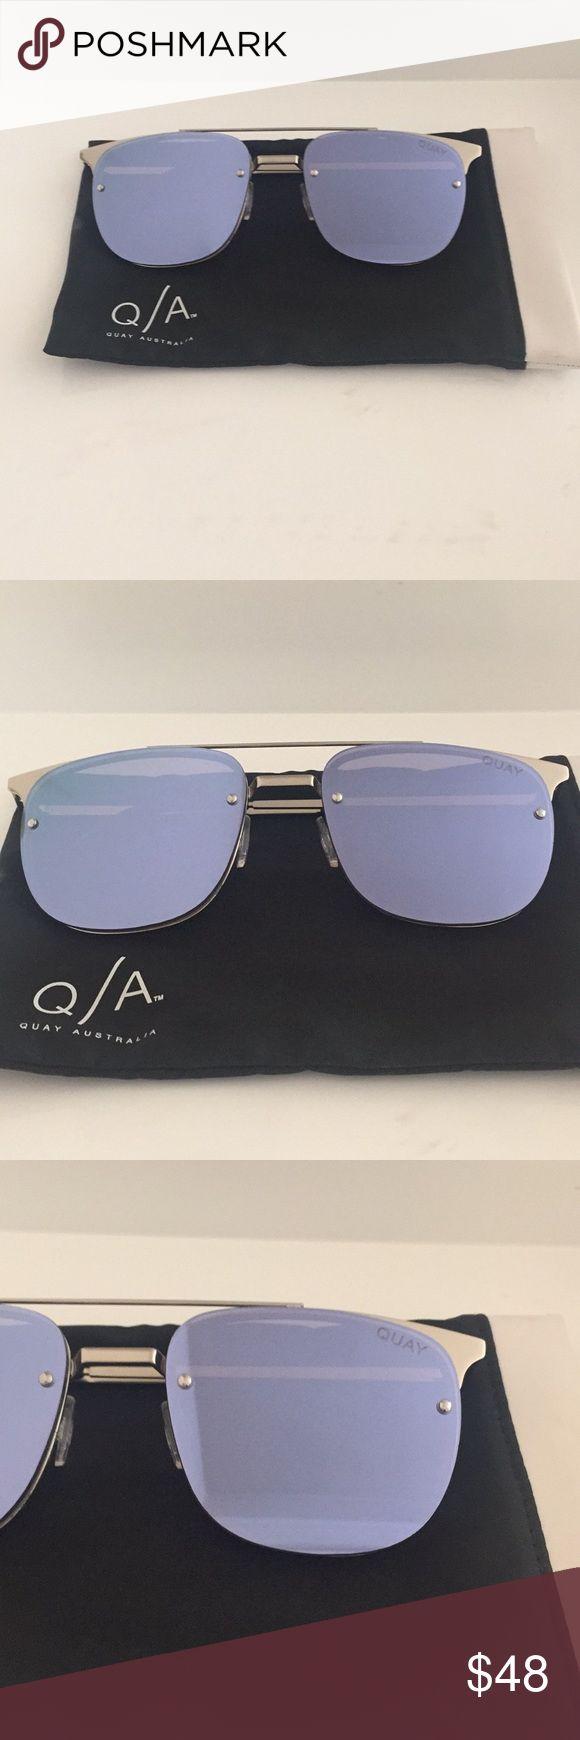 Quay Australia Private Eyes Mirrored Sunglasses In 2021 Mirrored Sunglasses Blue Mirrored Sunglasses Quay Australia